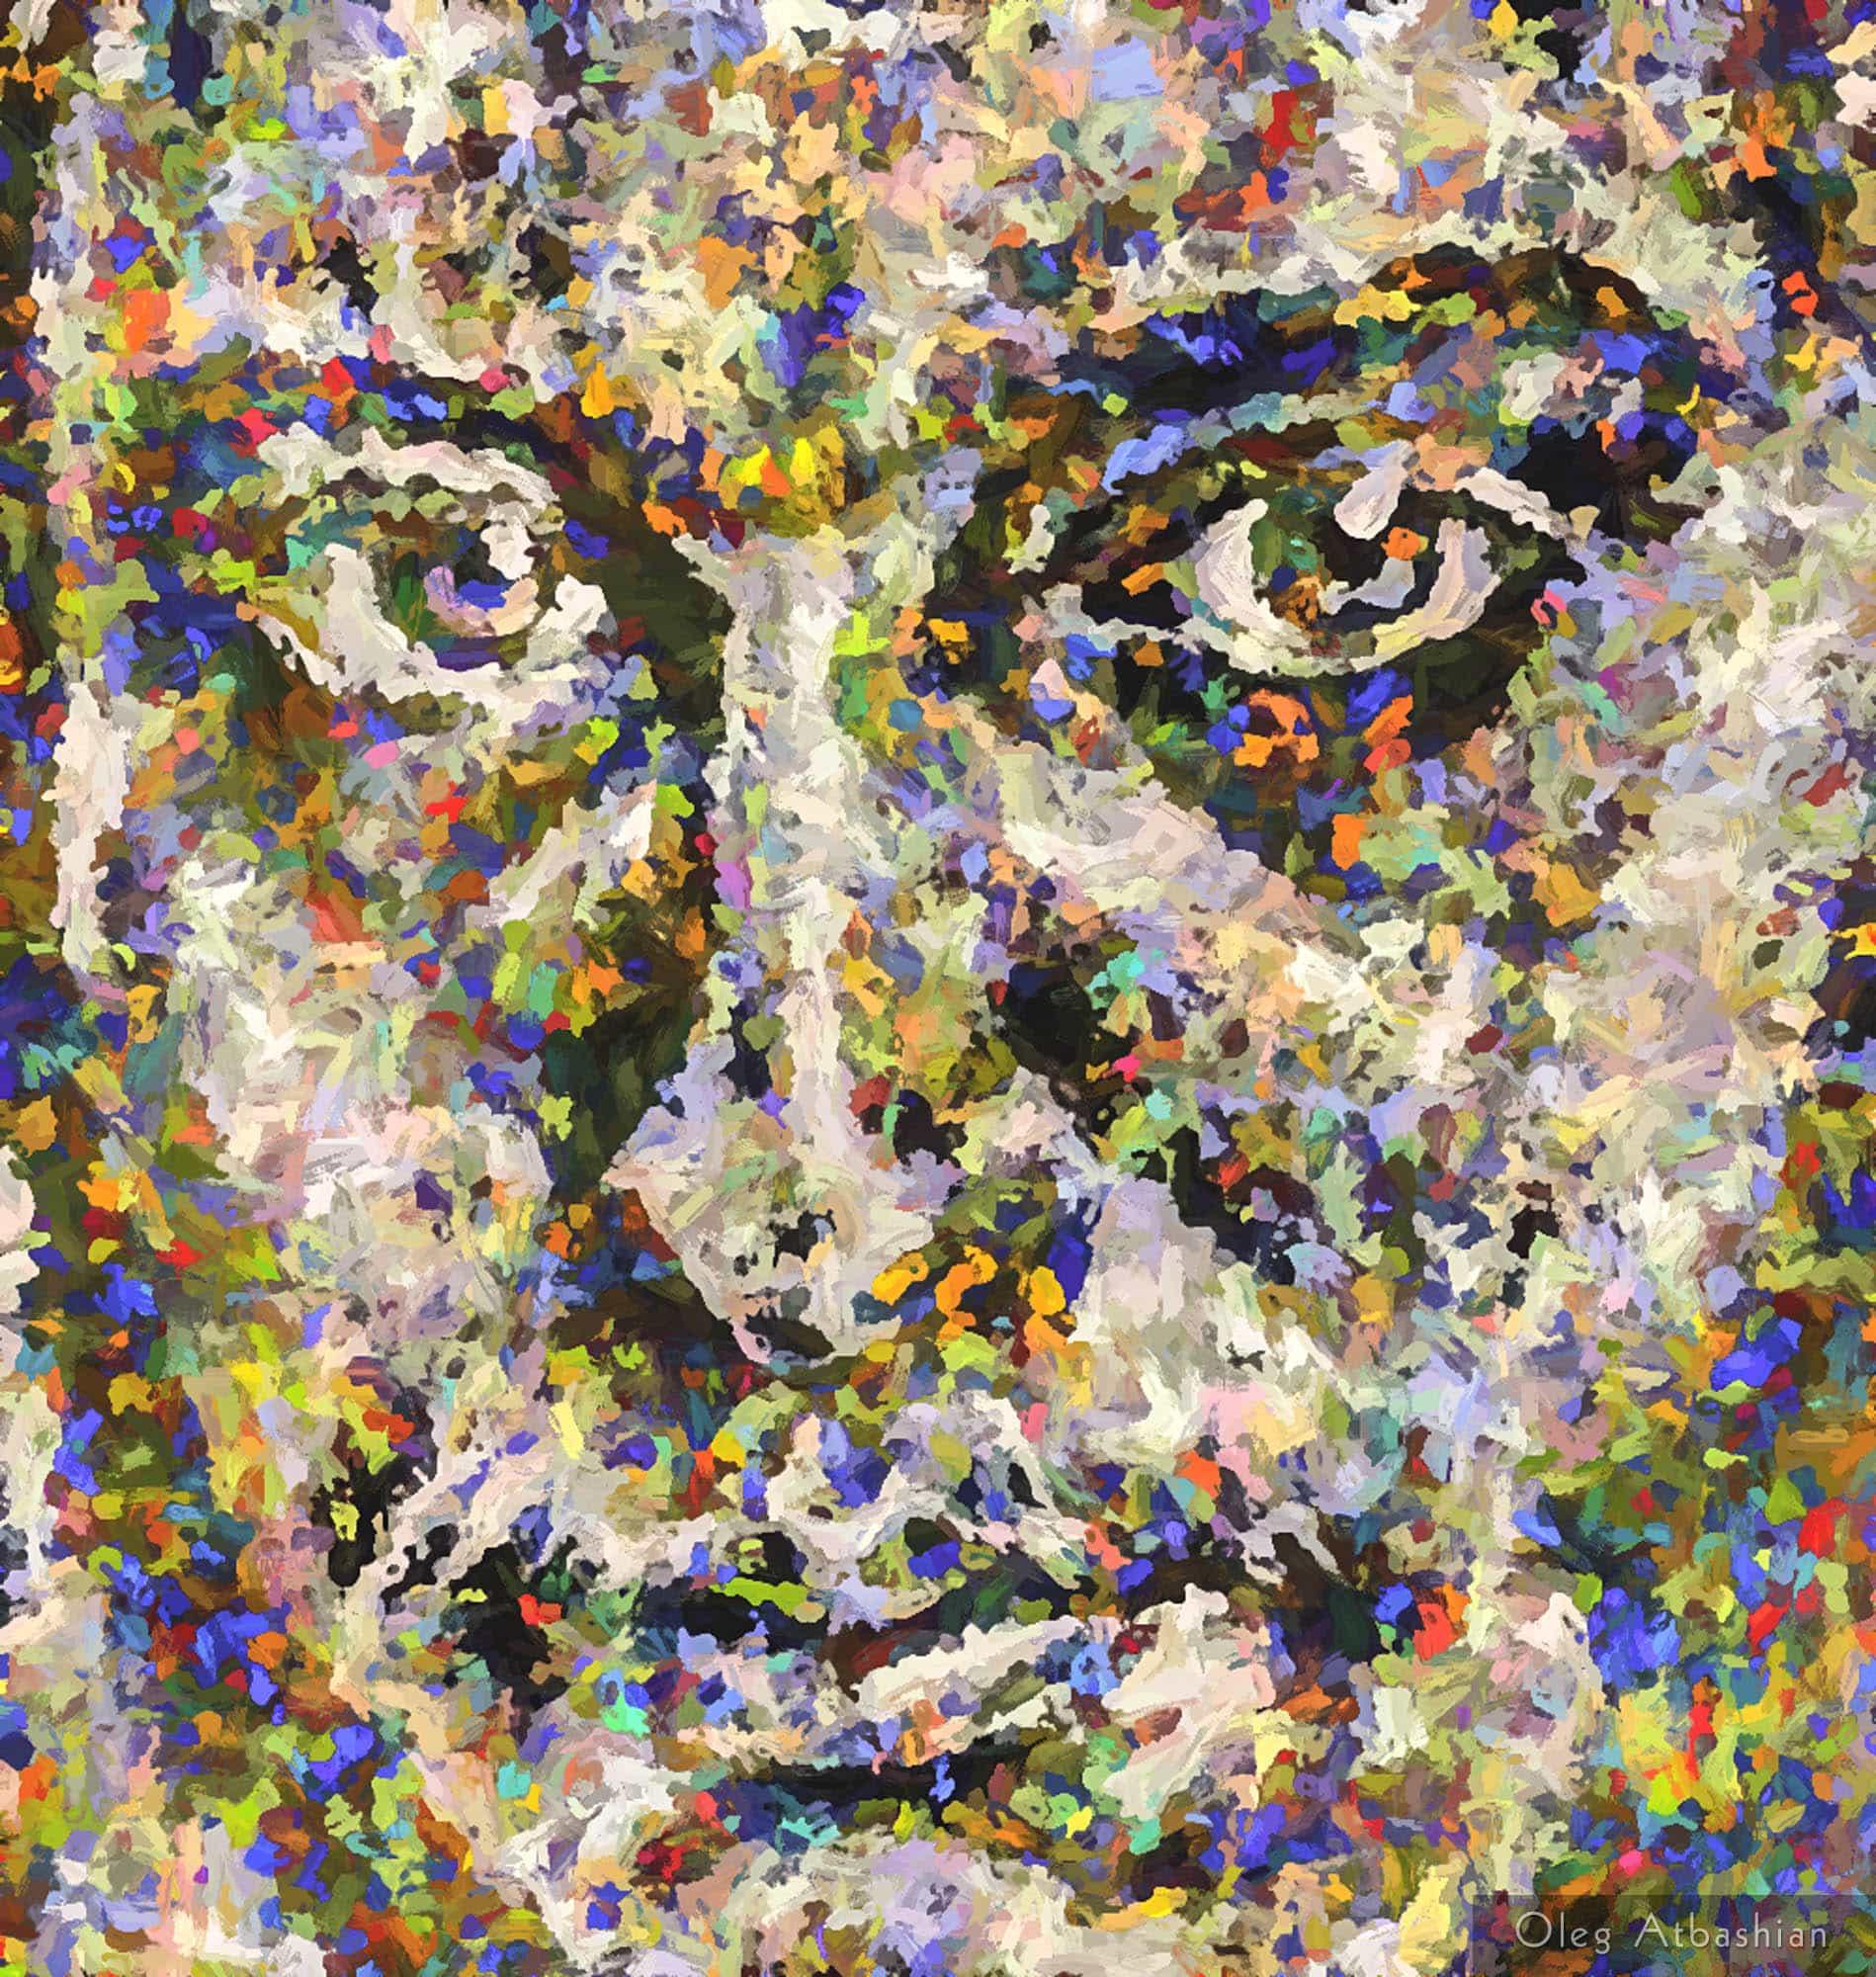 Self Portrait with a Beard, Pointillism